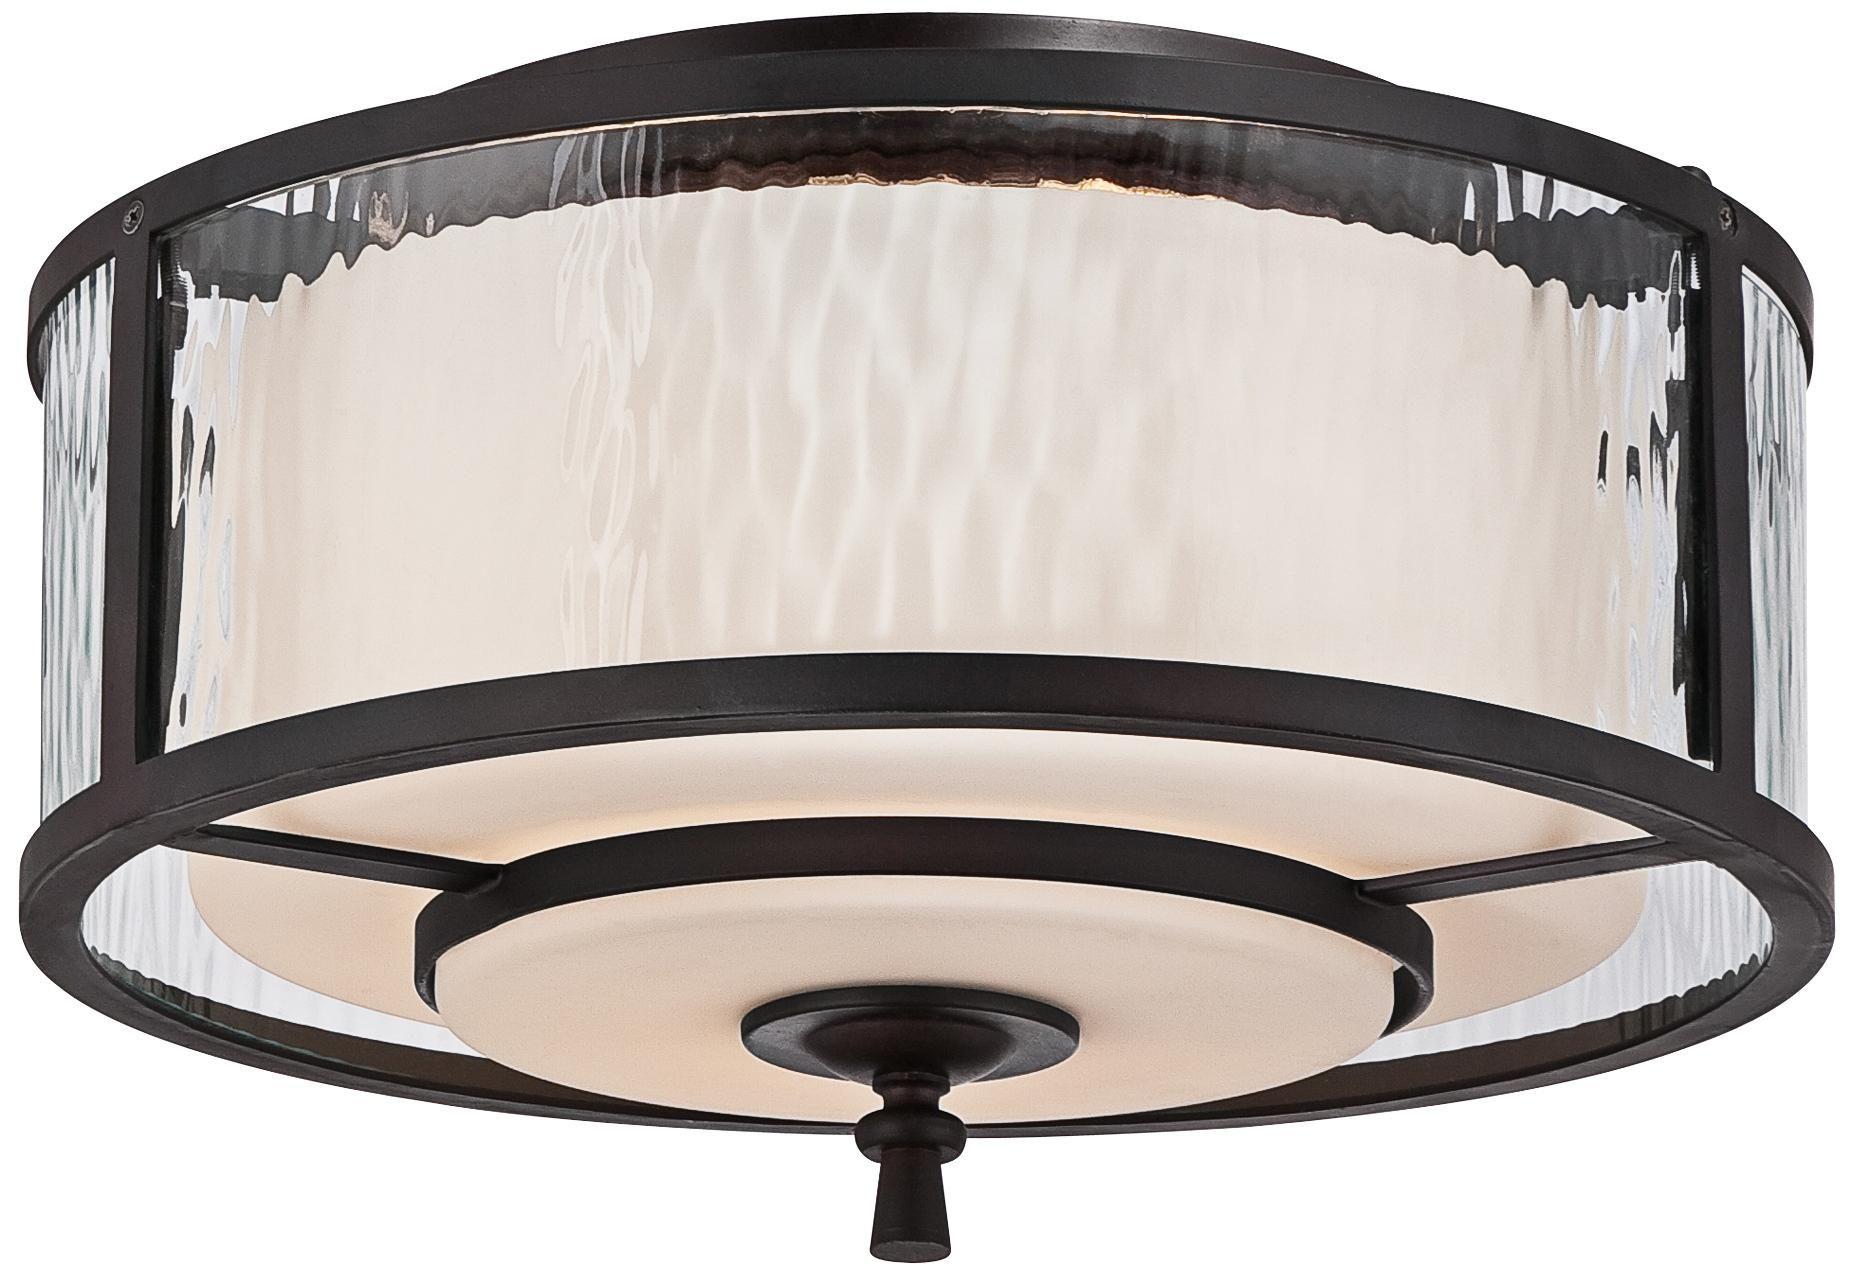 Adonis 15 wide flush mount quoizel ceiling light lighting adonis 15 wide flush mount quoizel ceiling light aloadofball Choice Image